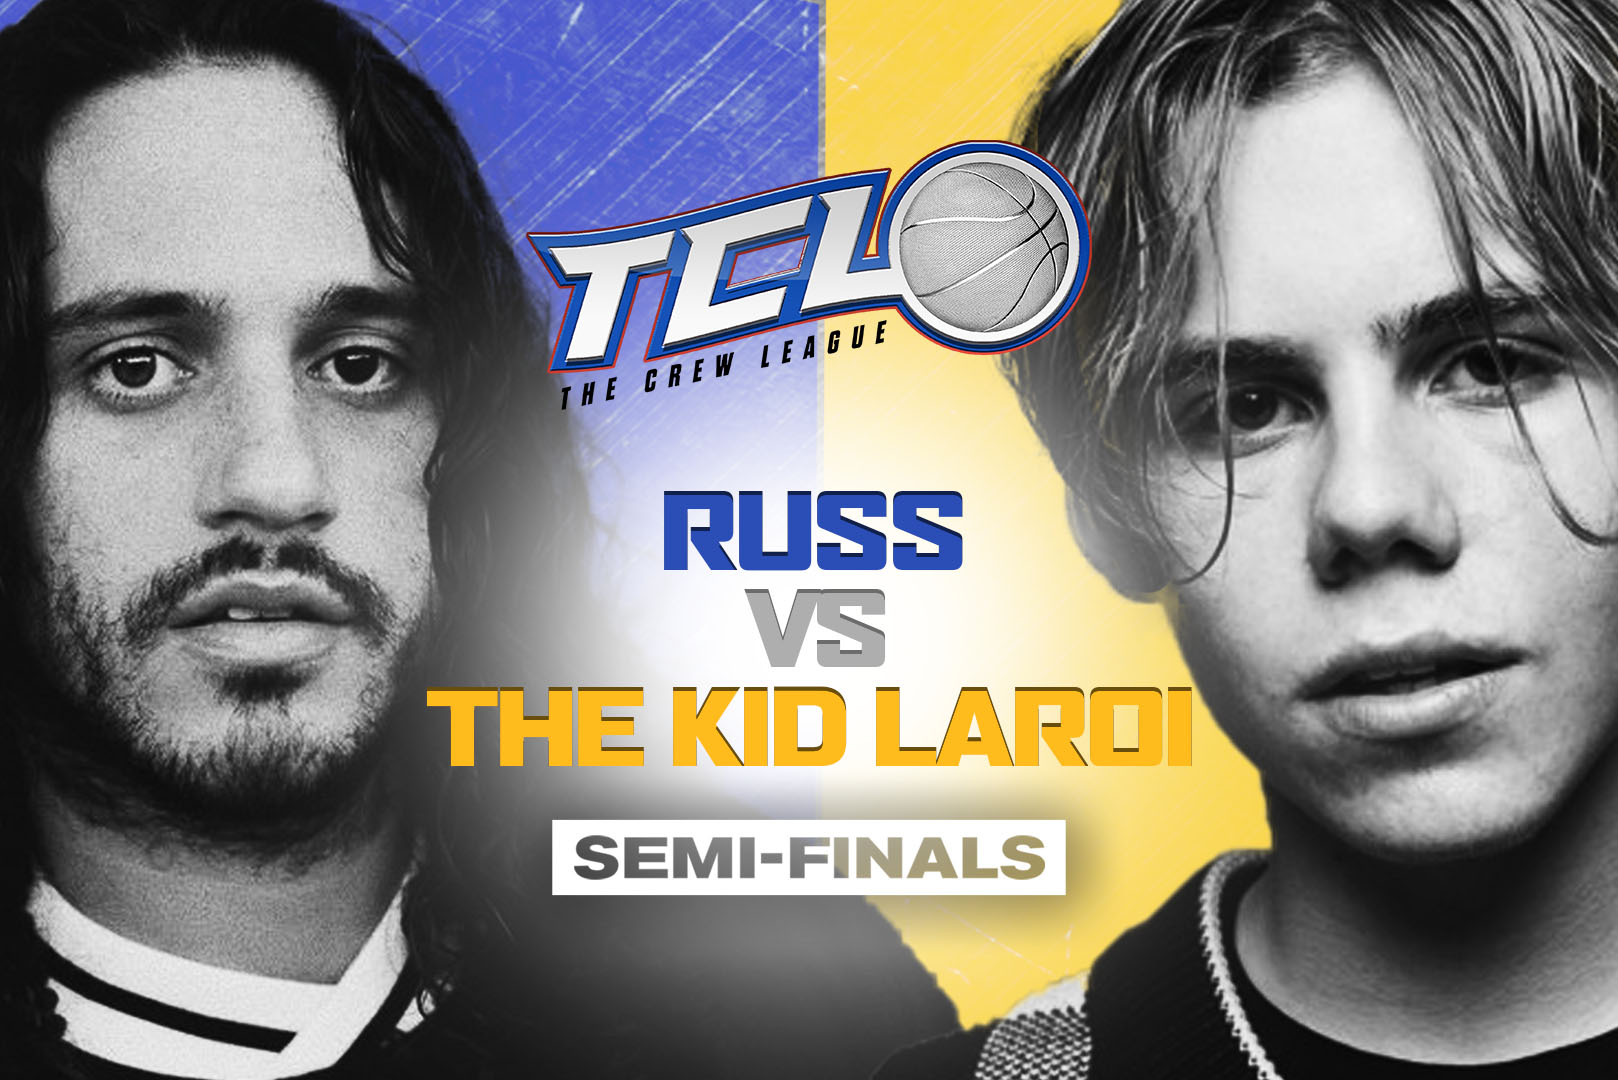 Russ vs The Kid Laroi